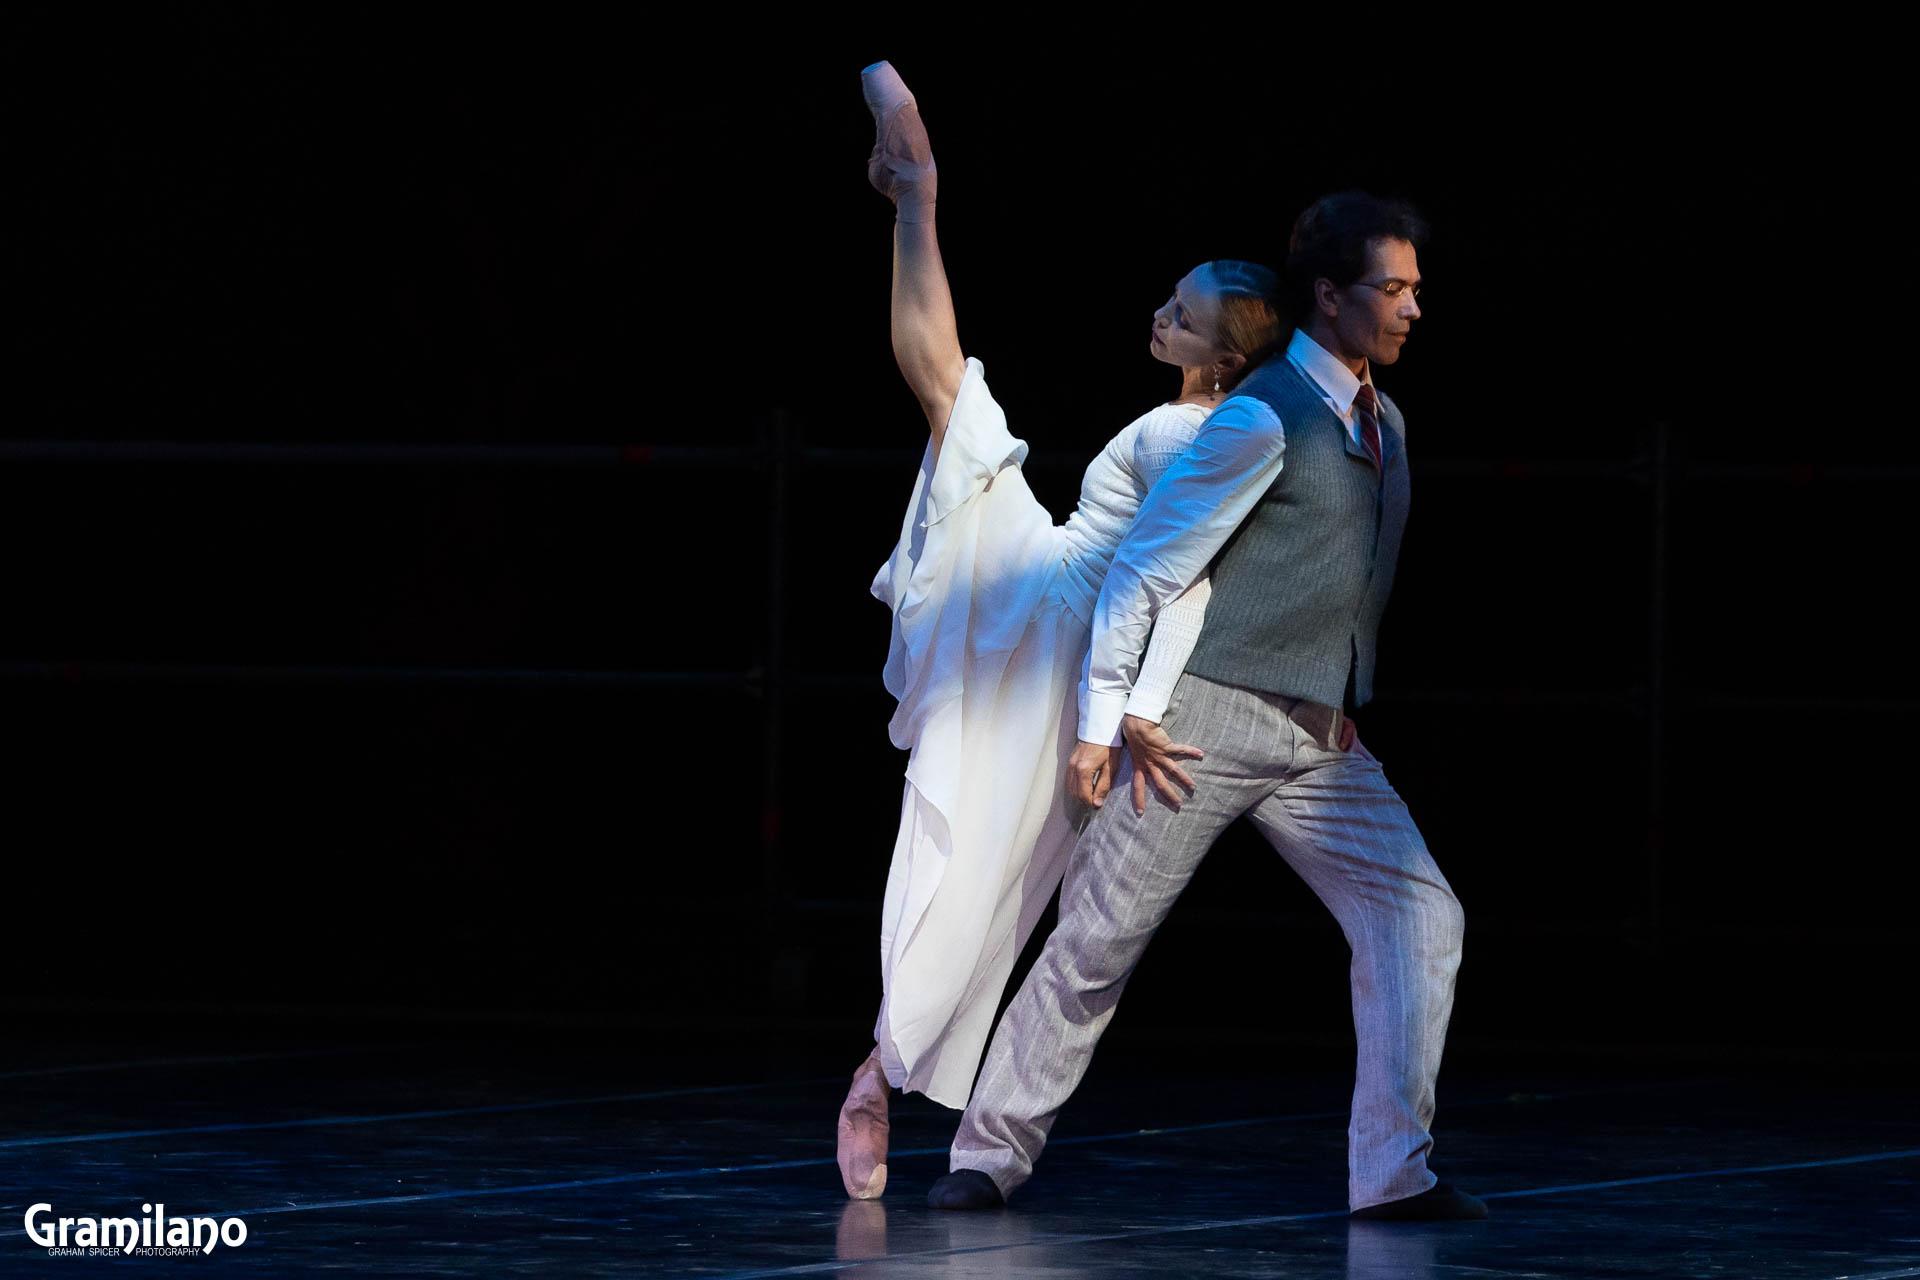 Silvia Azzoni and Alexandre Ryabko in John Neumeier's Nocturnes